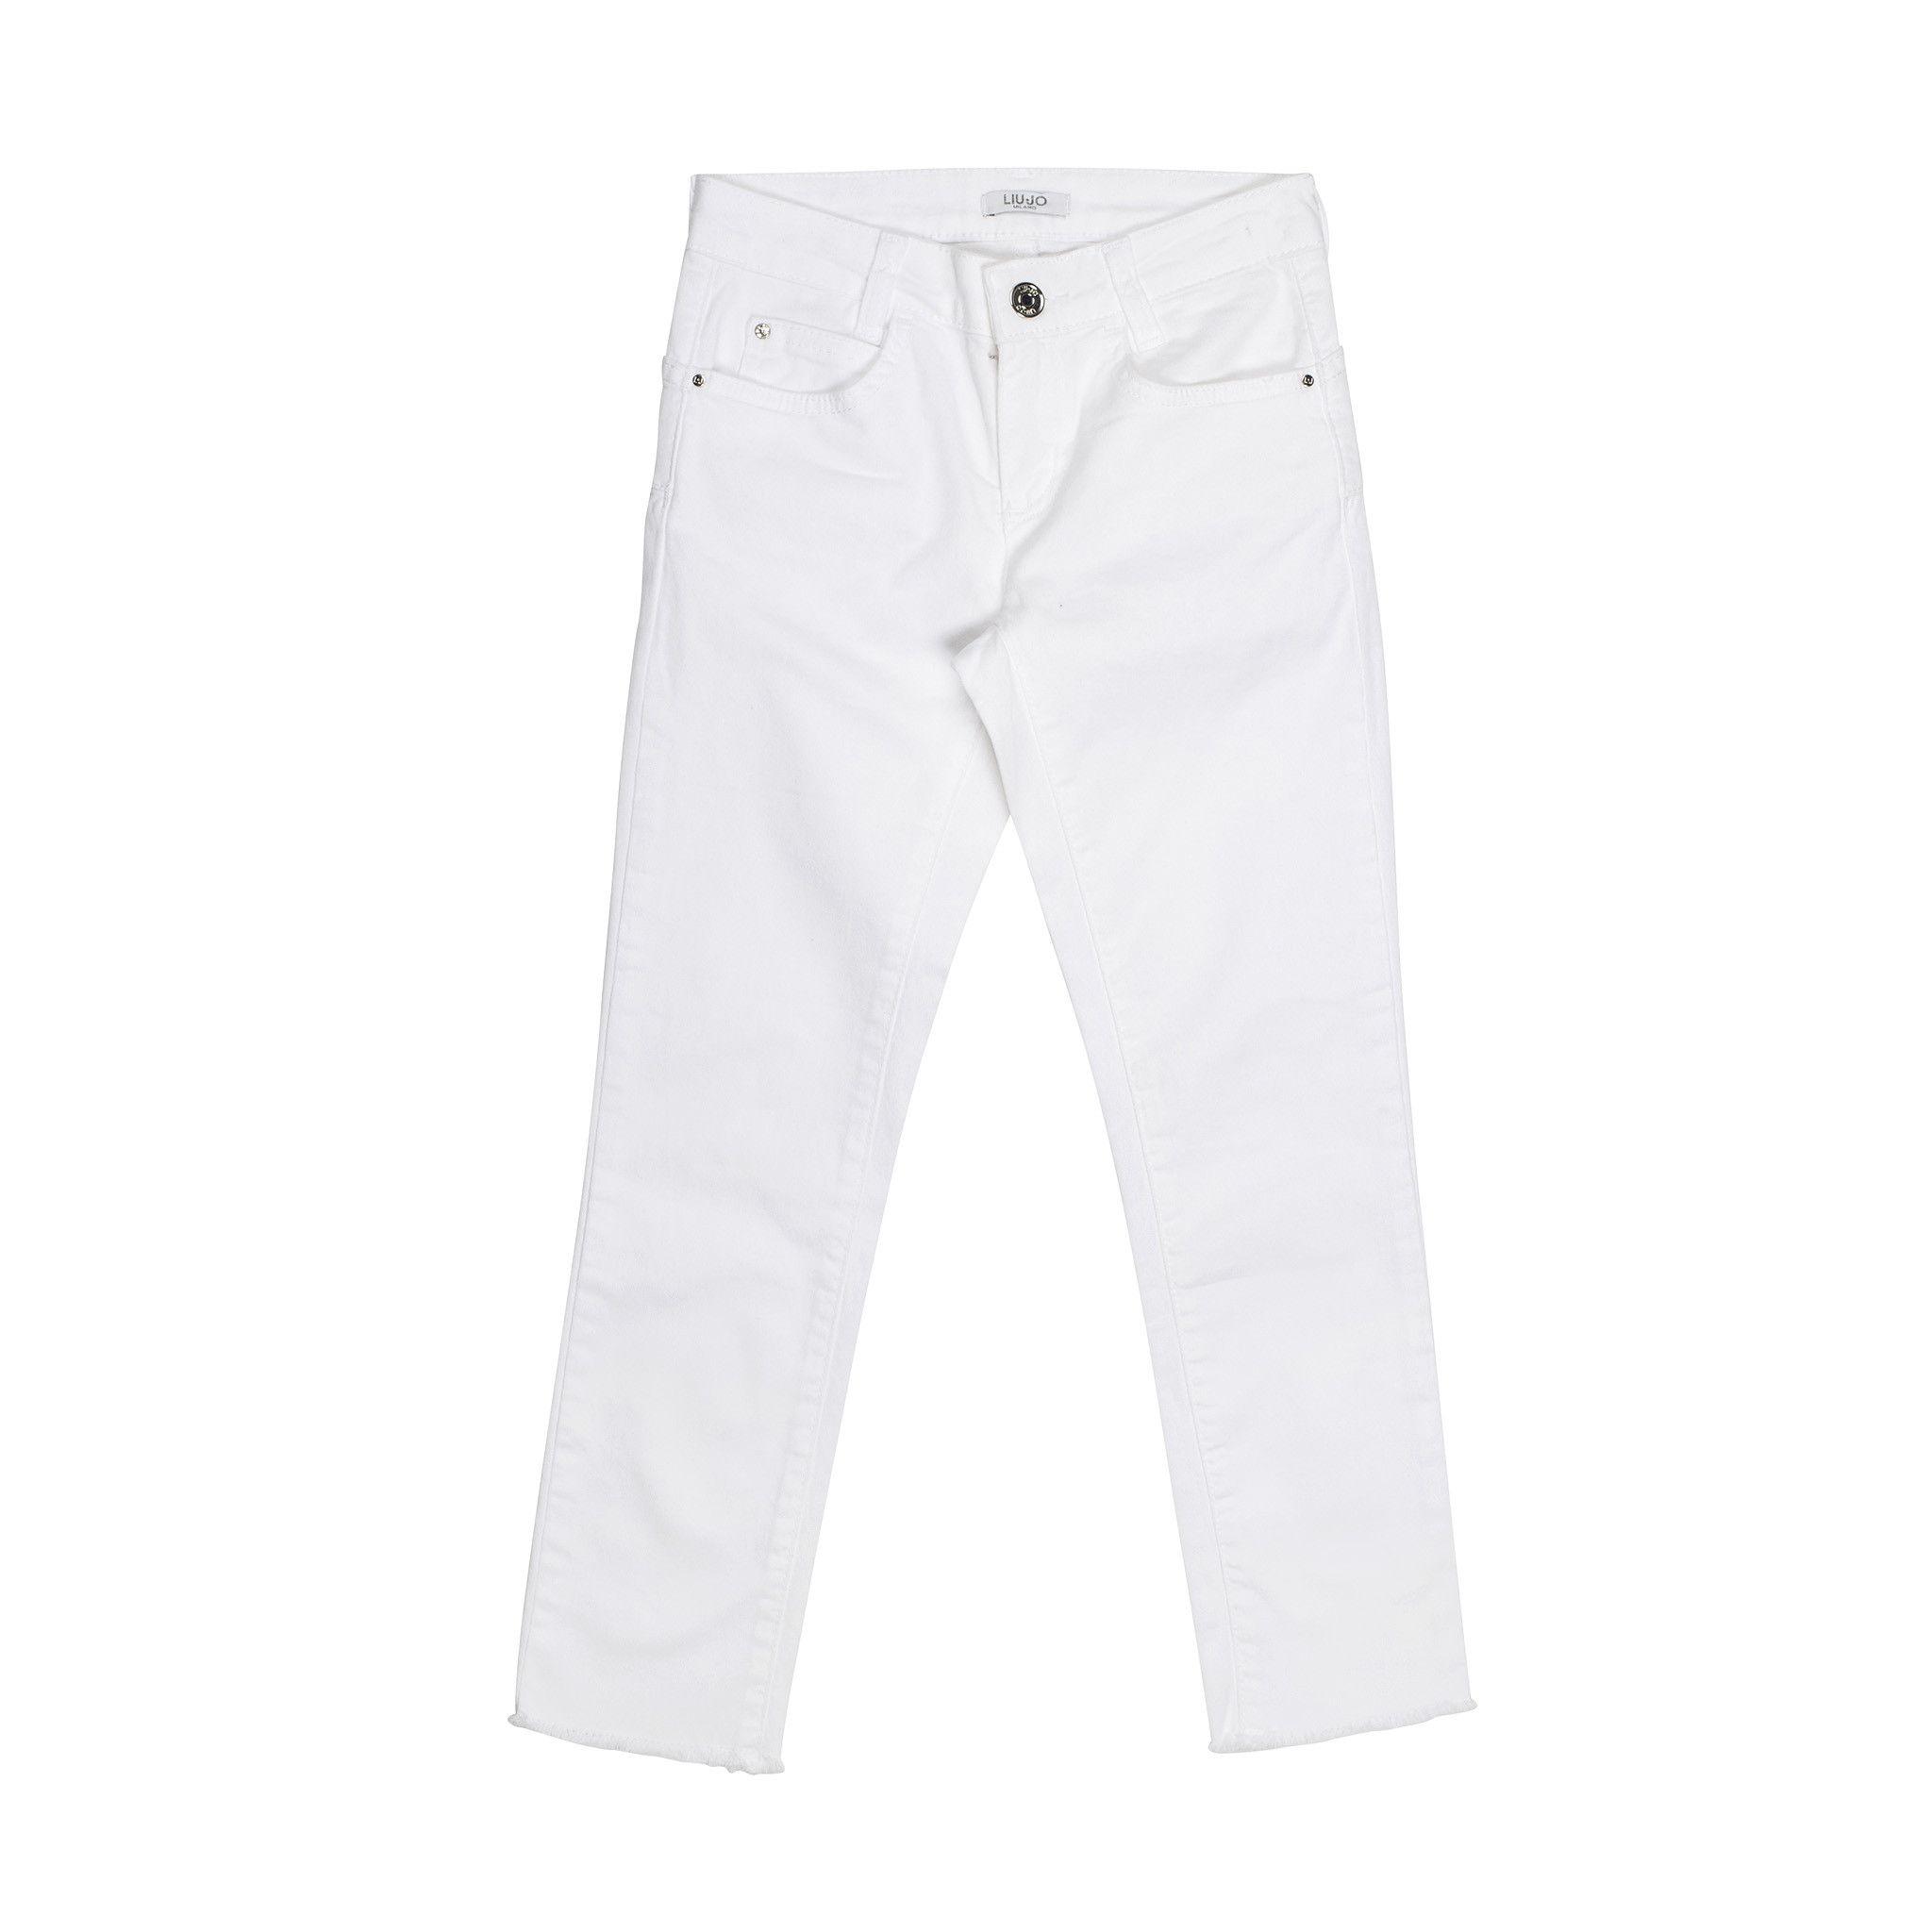 Liu Jo  Jeans In White